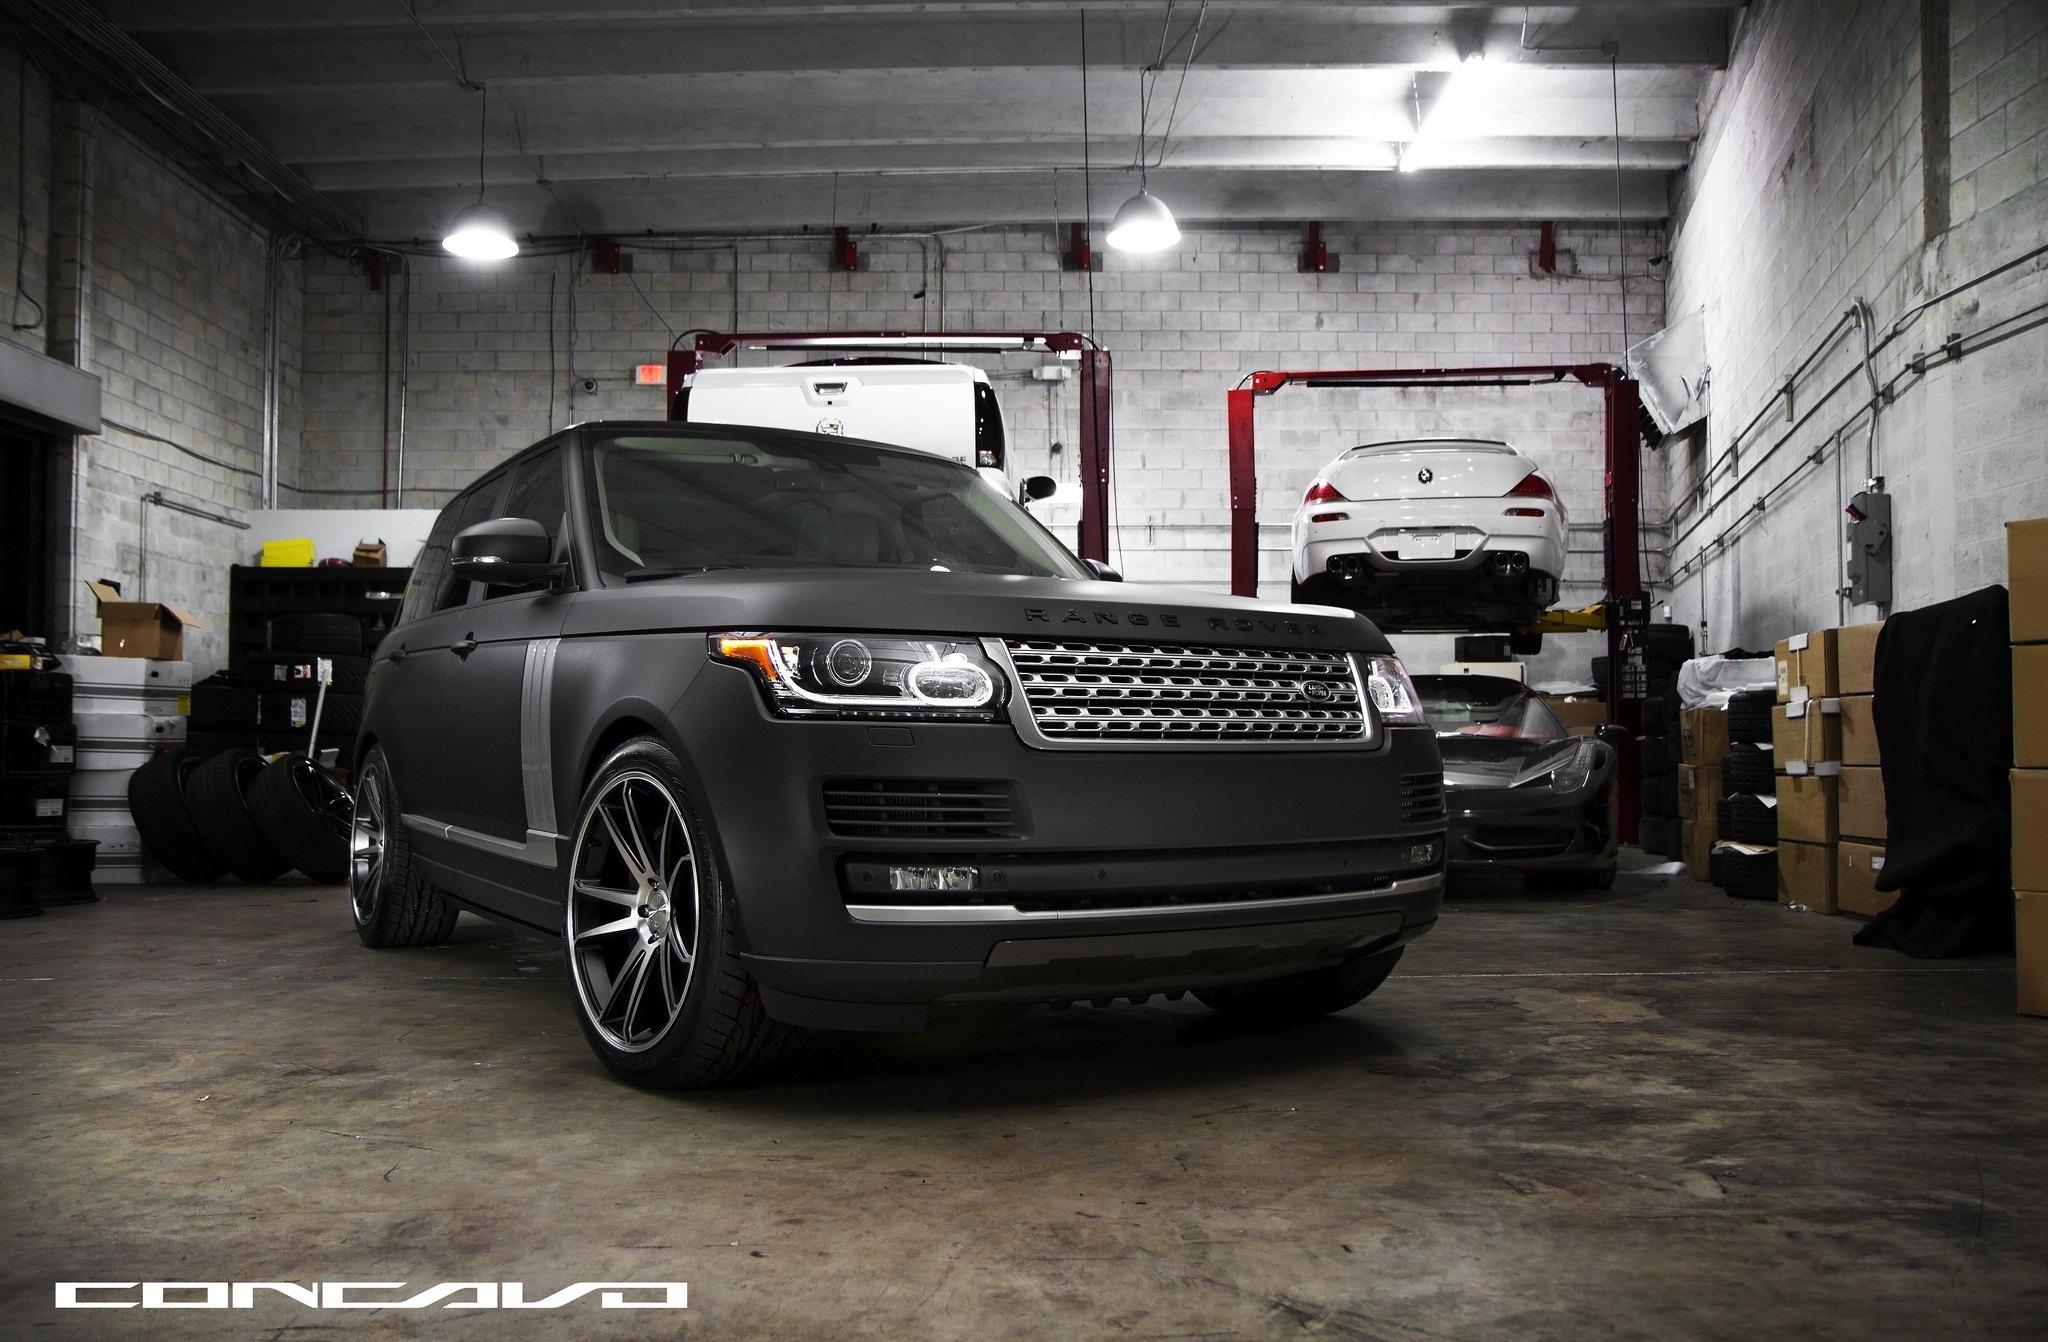 Pure Luxury Matte Black Range Rover Vogue by Concavo — CARiD